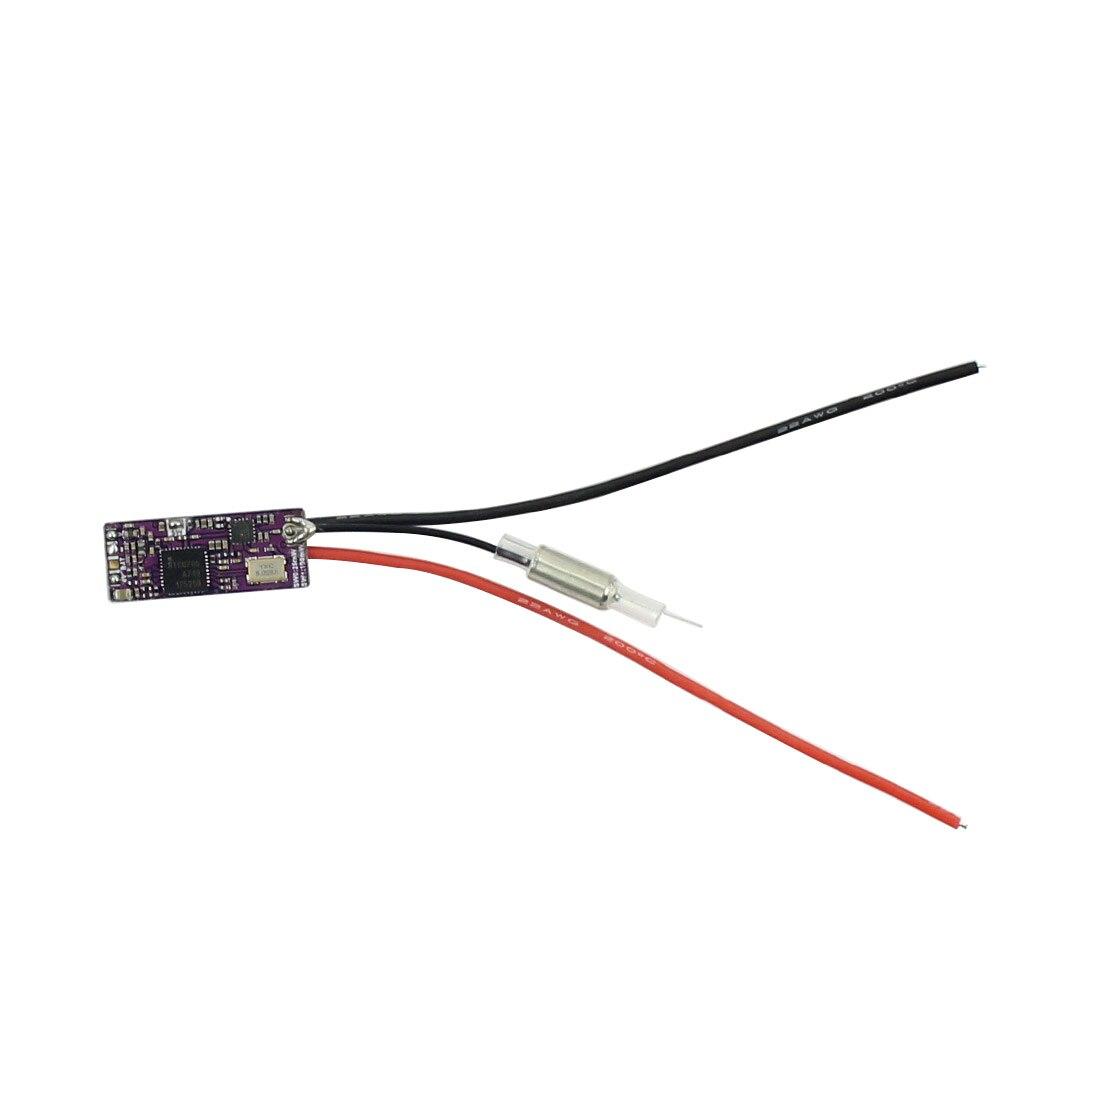 Kingkong Q100 Mini 5,8G 16CH VTX аксессуары для передачи изображений для FPV Racer Mini Drone Quadcopter